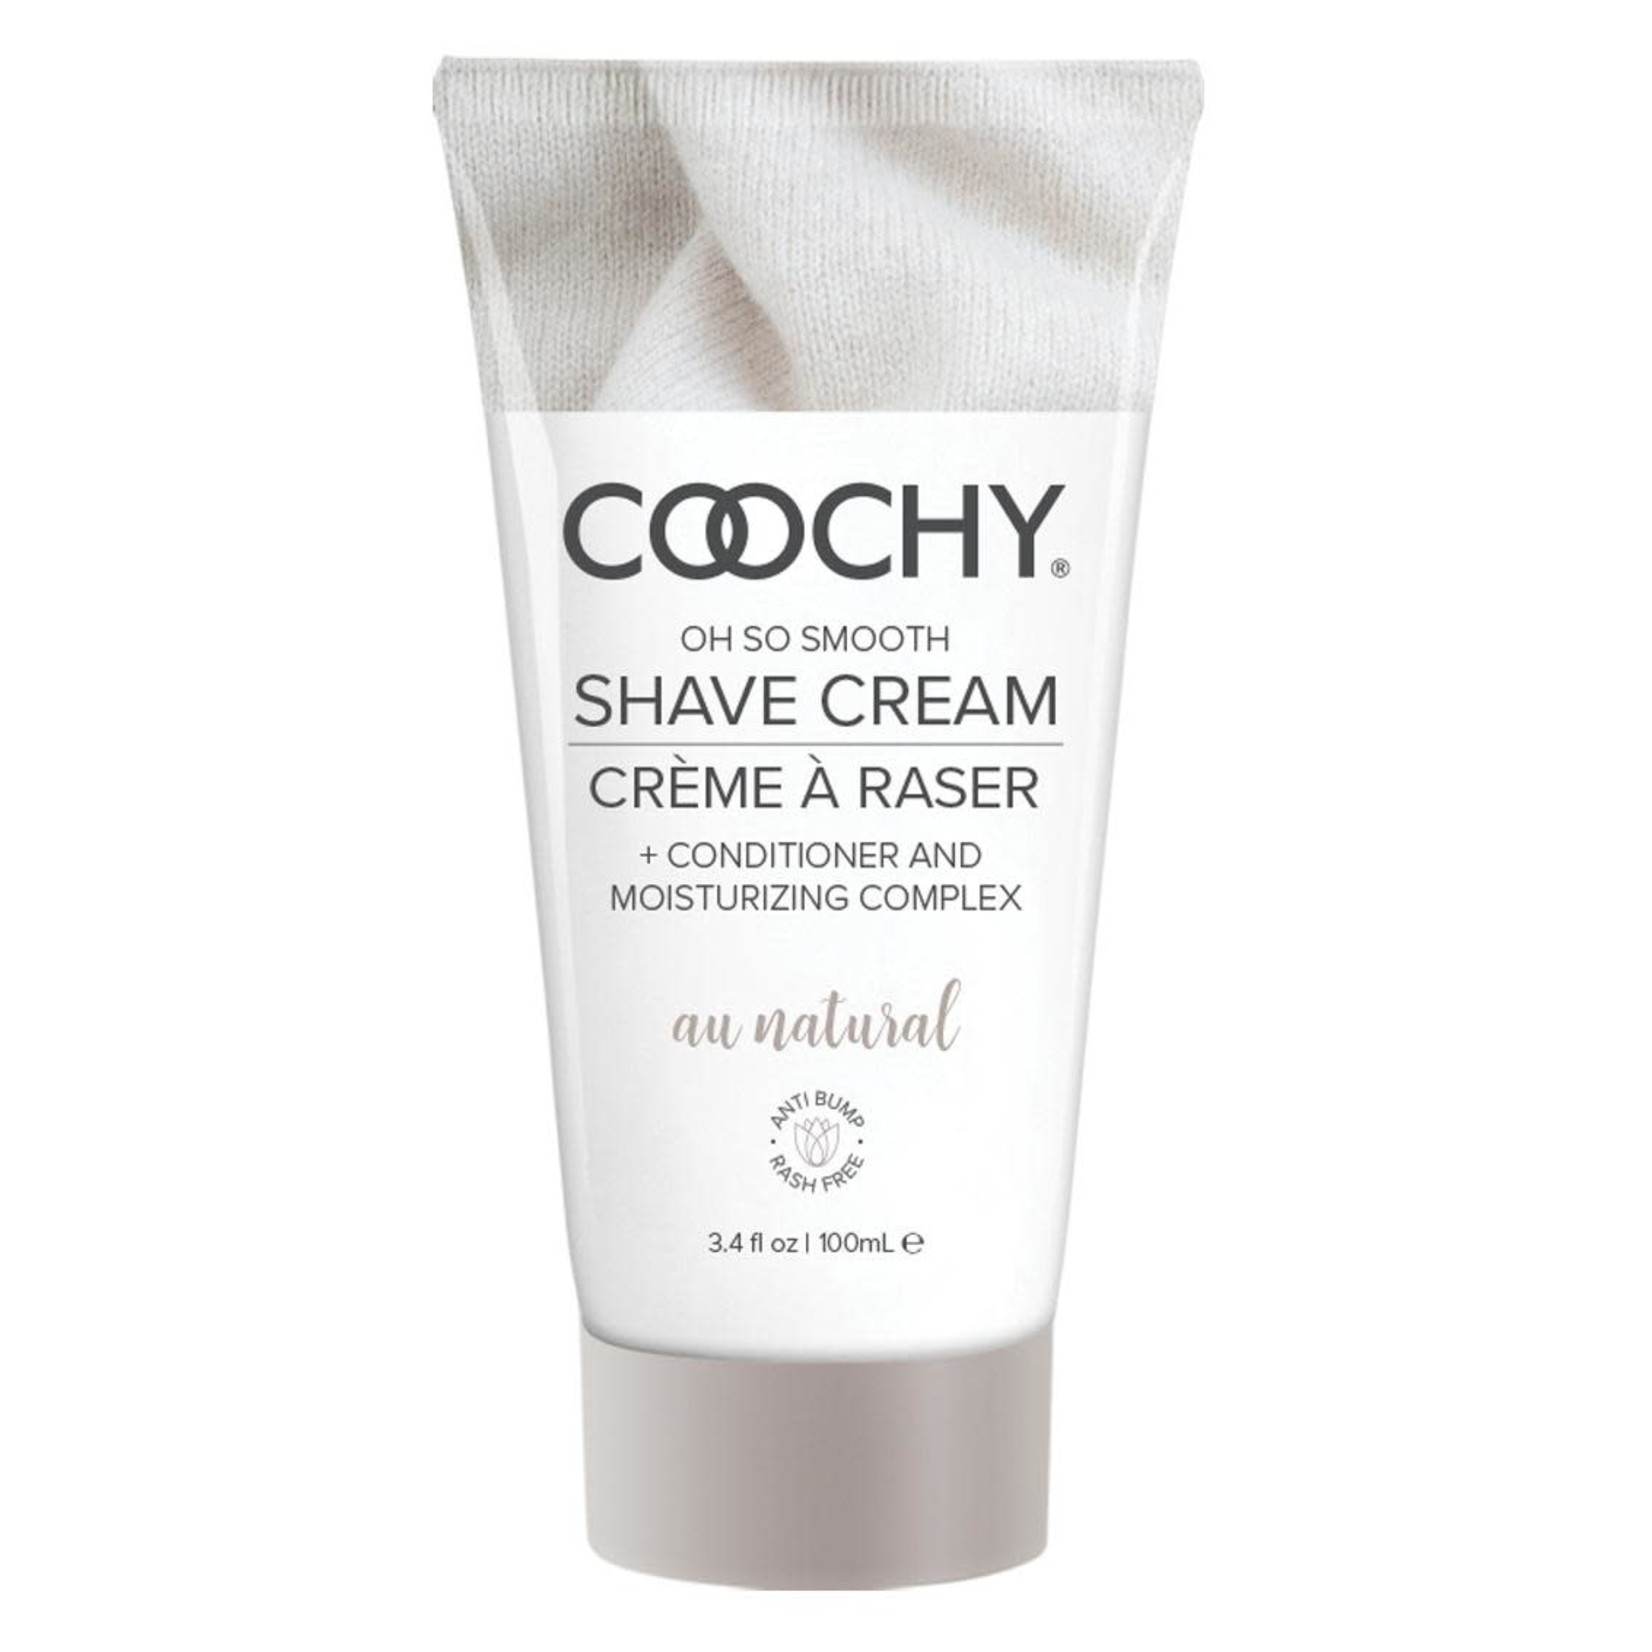 Coochy Shave Cream-Au Natural 3.4oz